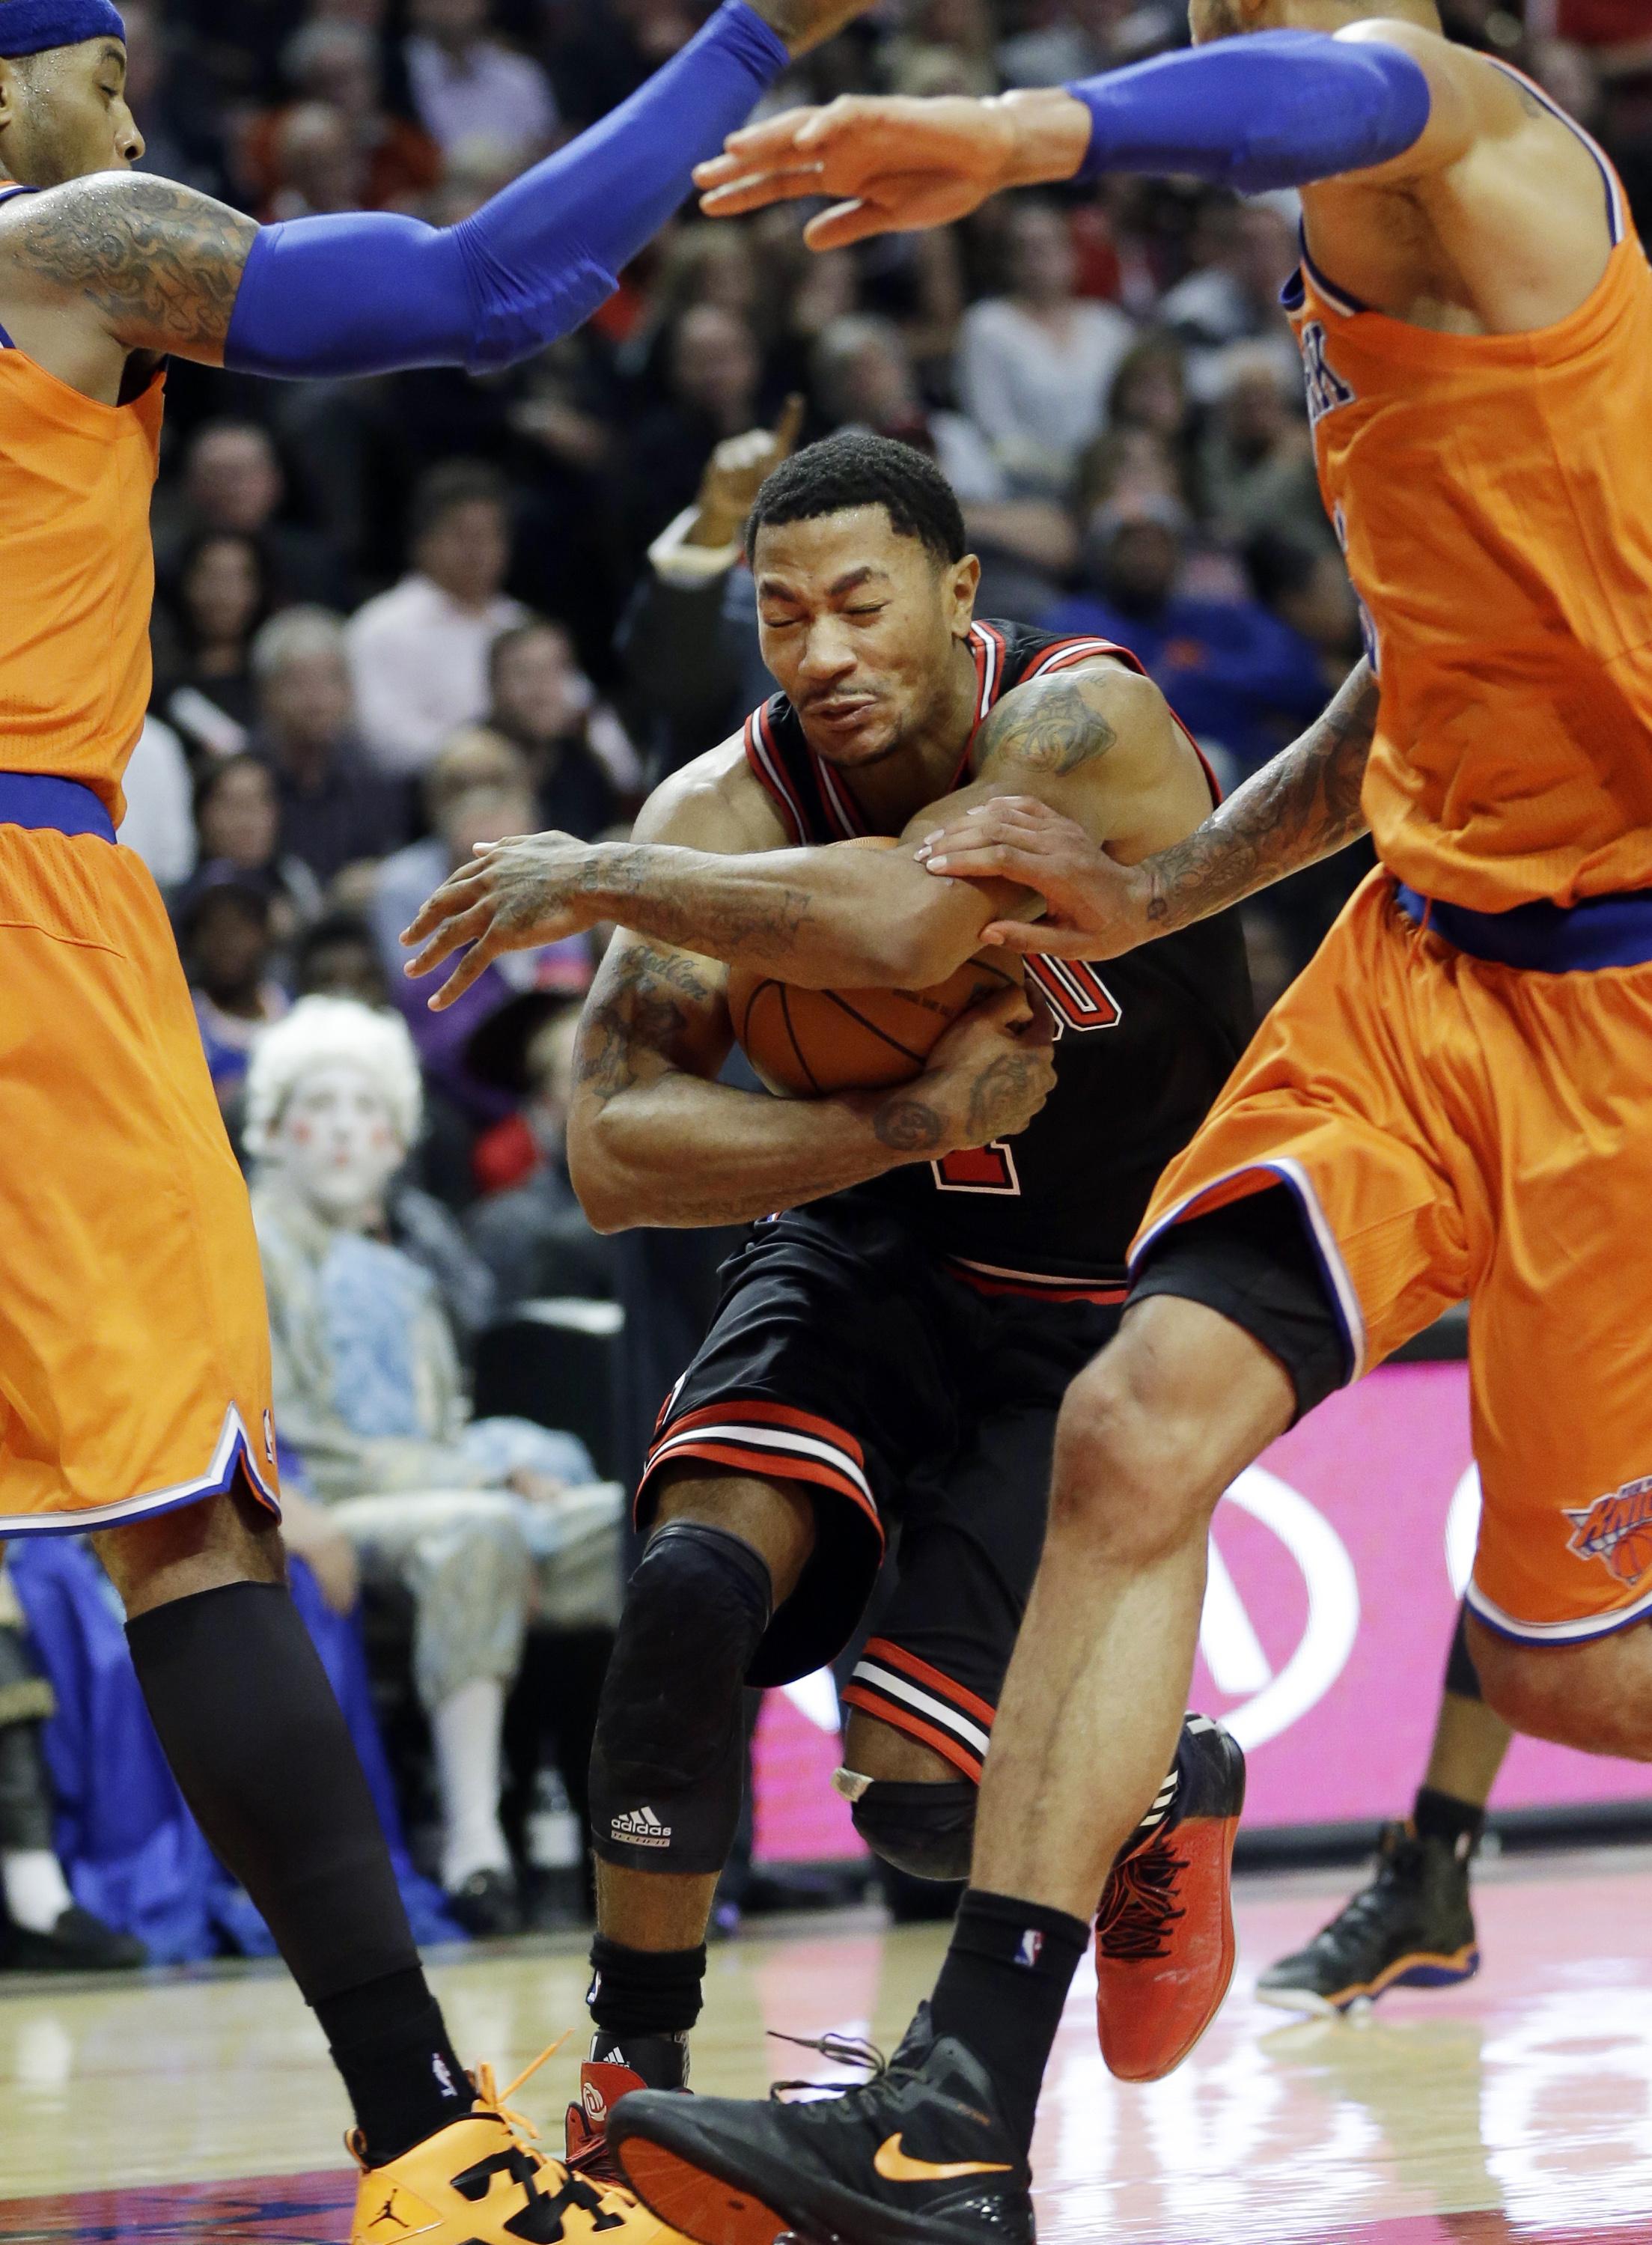 27140ccaecc Chicago Bulls guard Derrick Rose drives to the basket Thursday night  against the New York Knicks